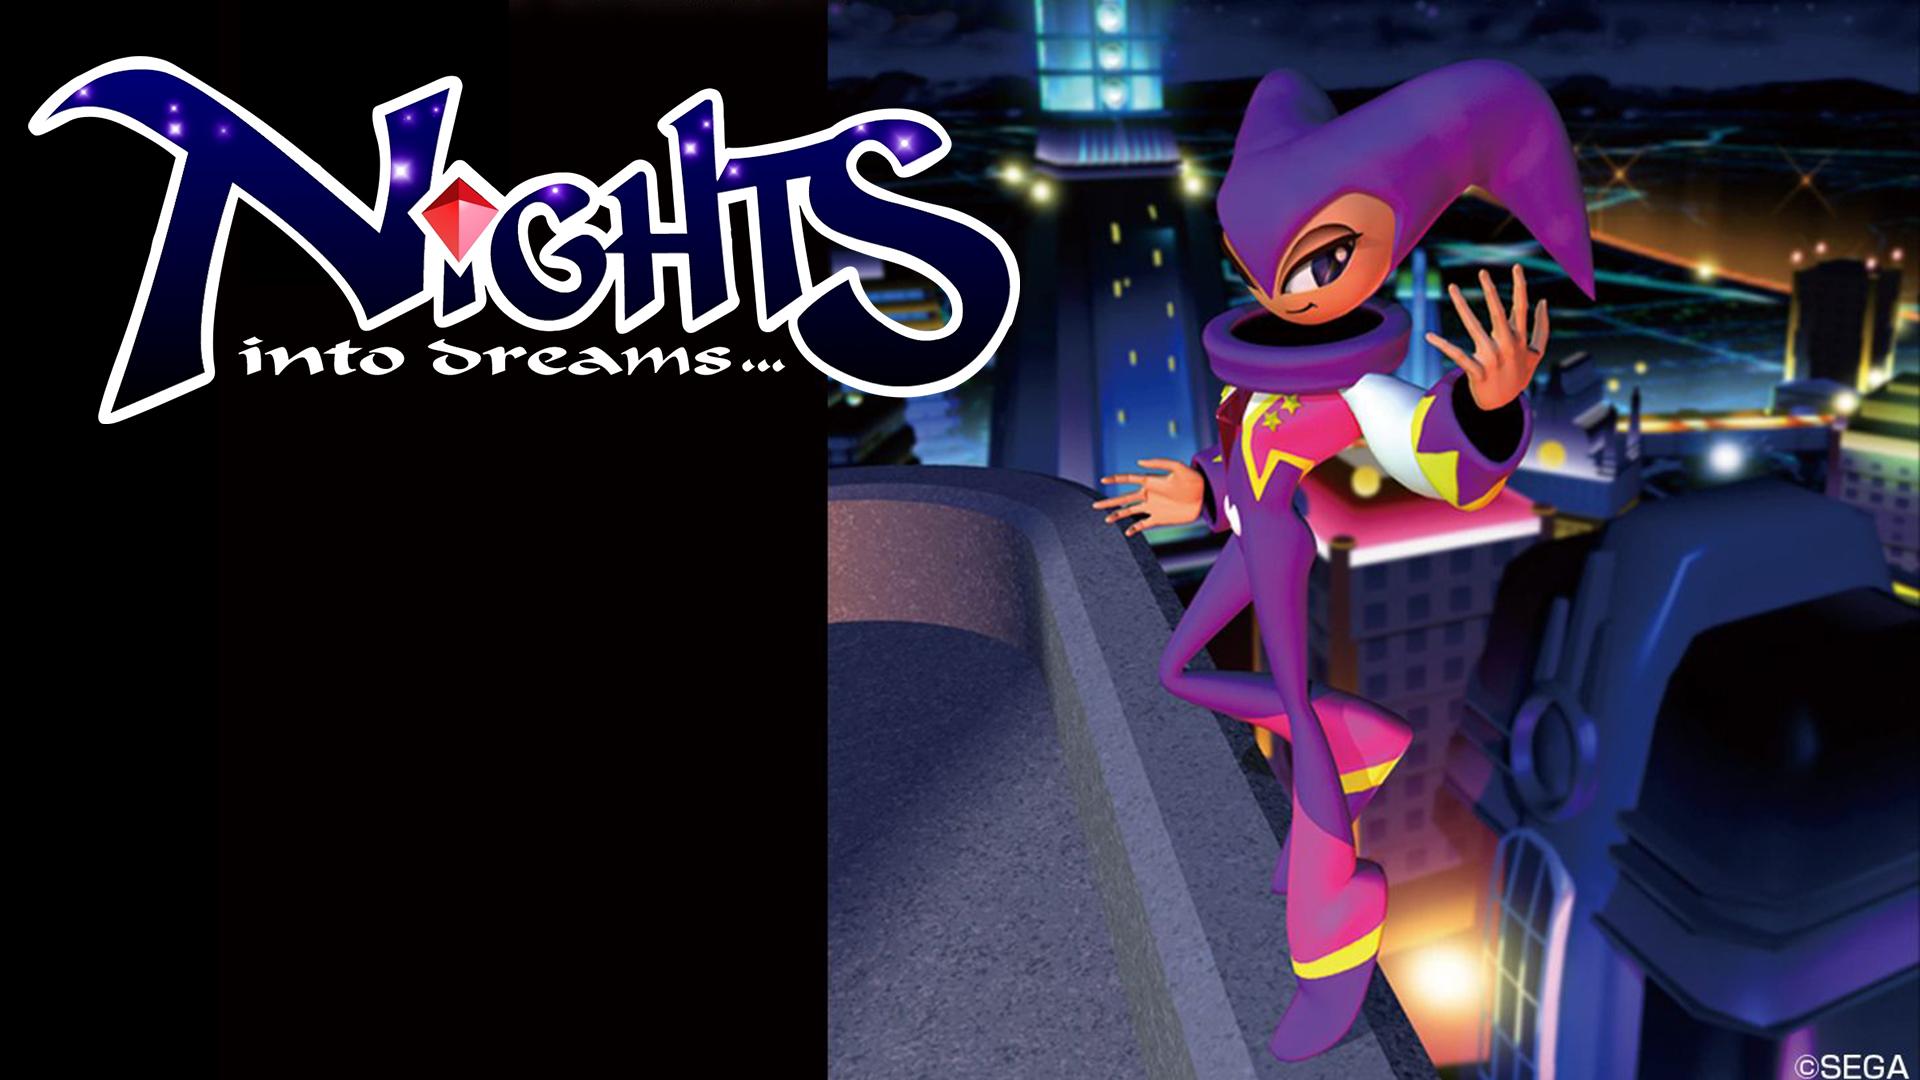 Sega Nights Fanart